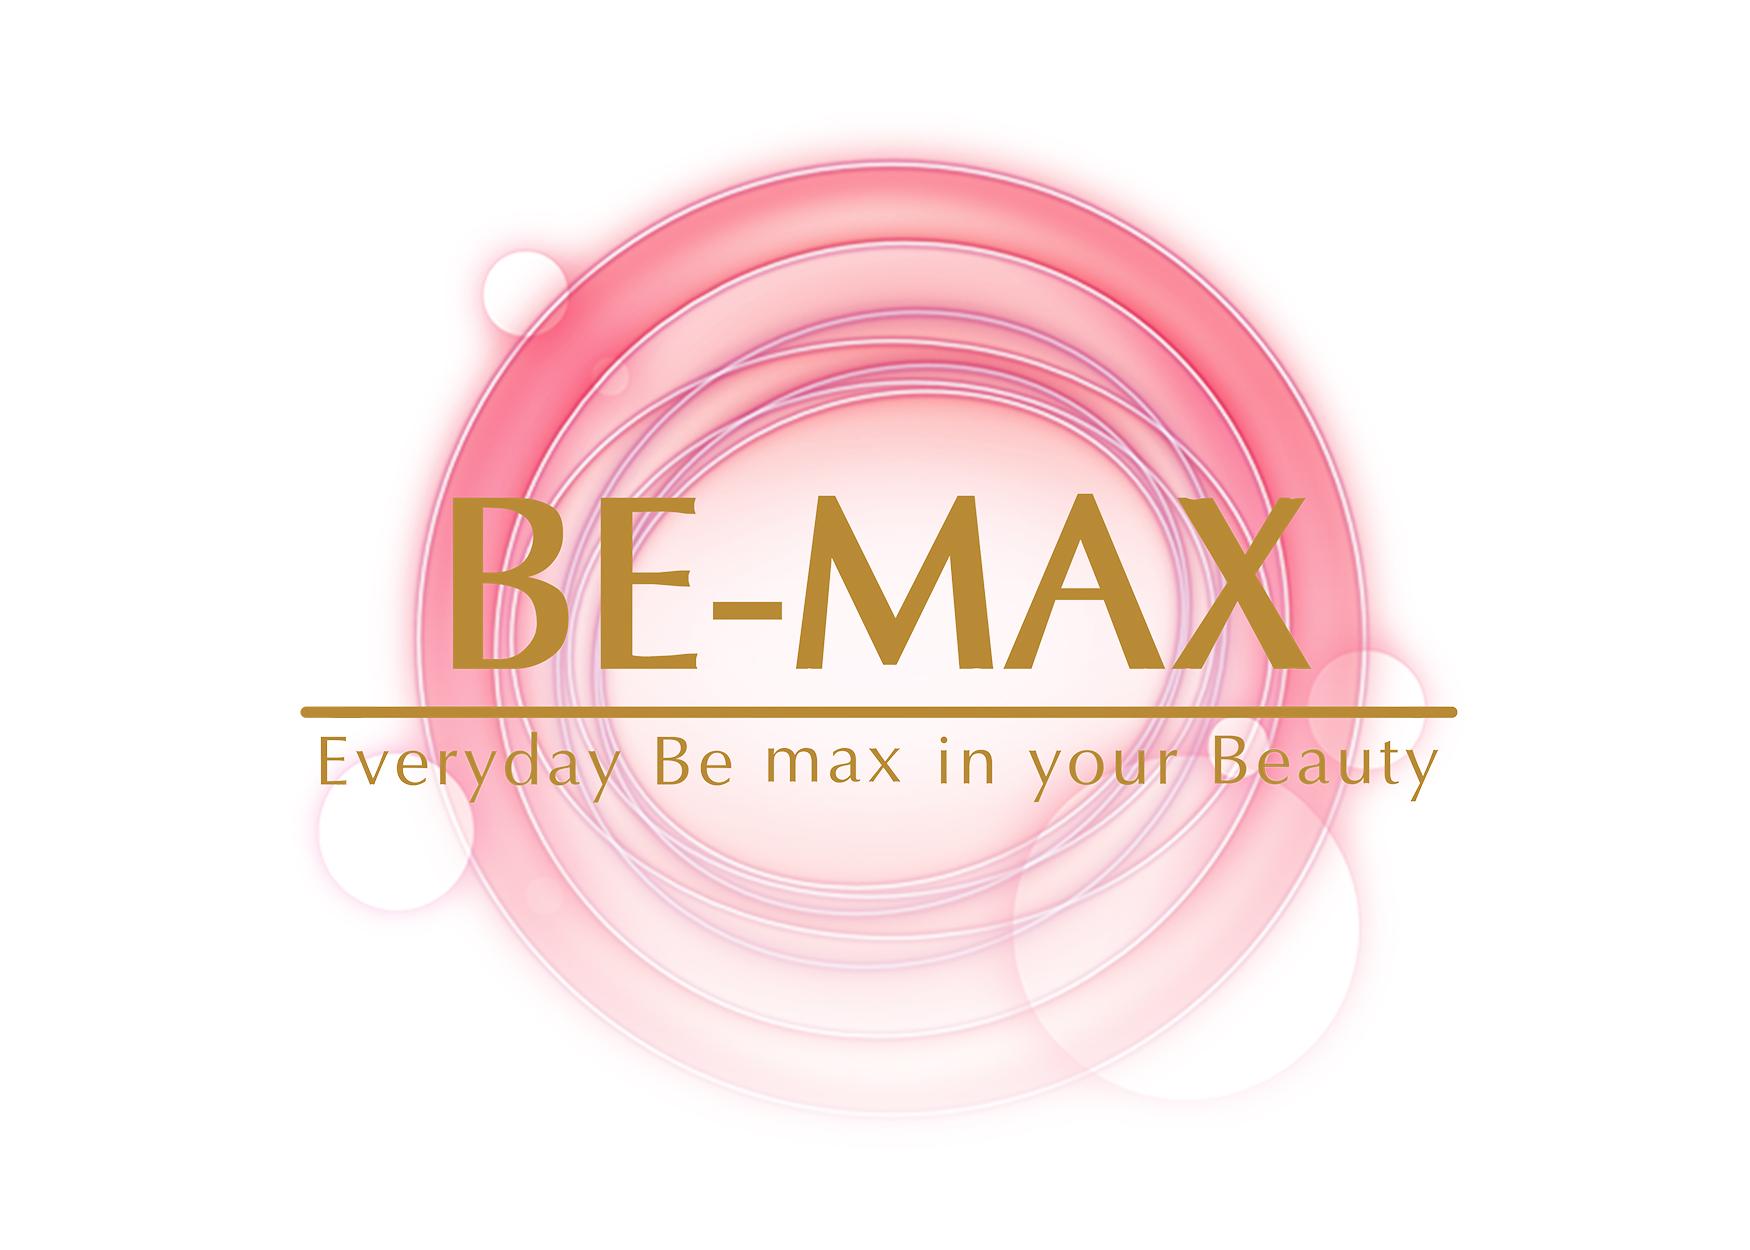 Be Max